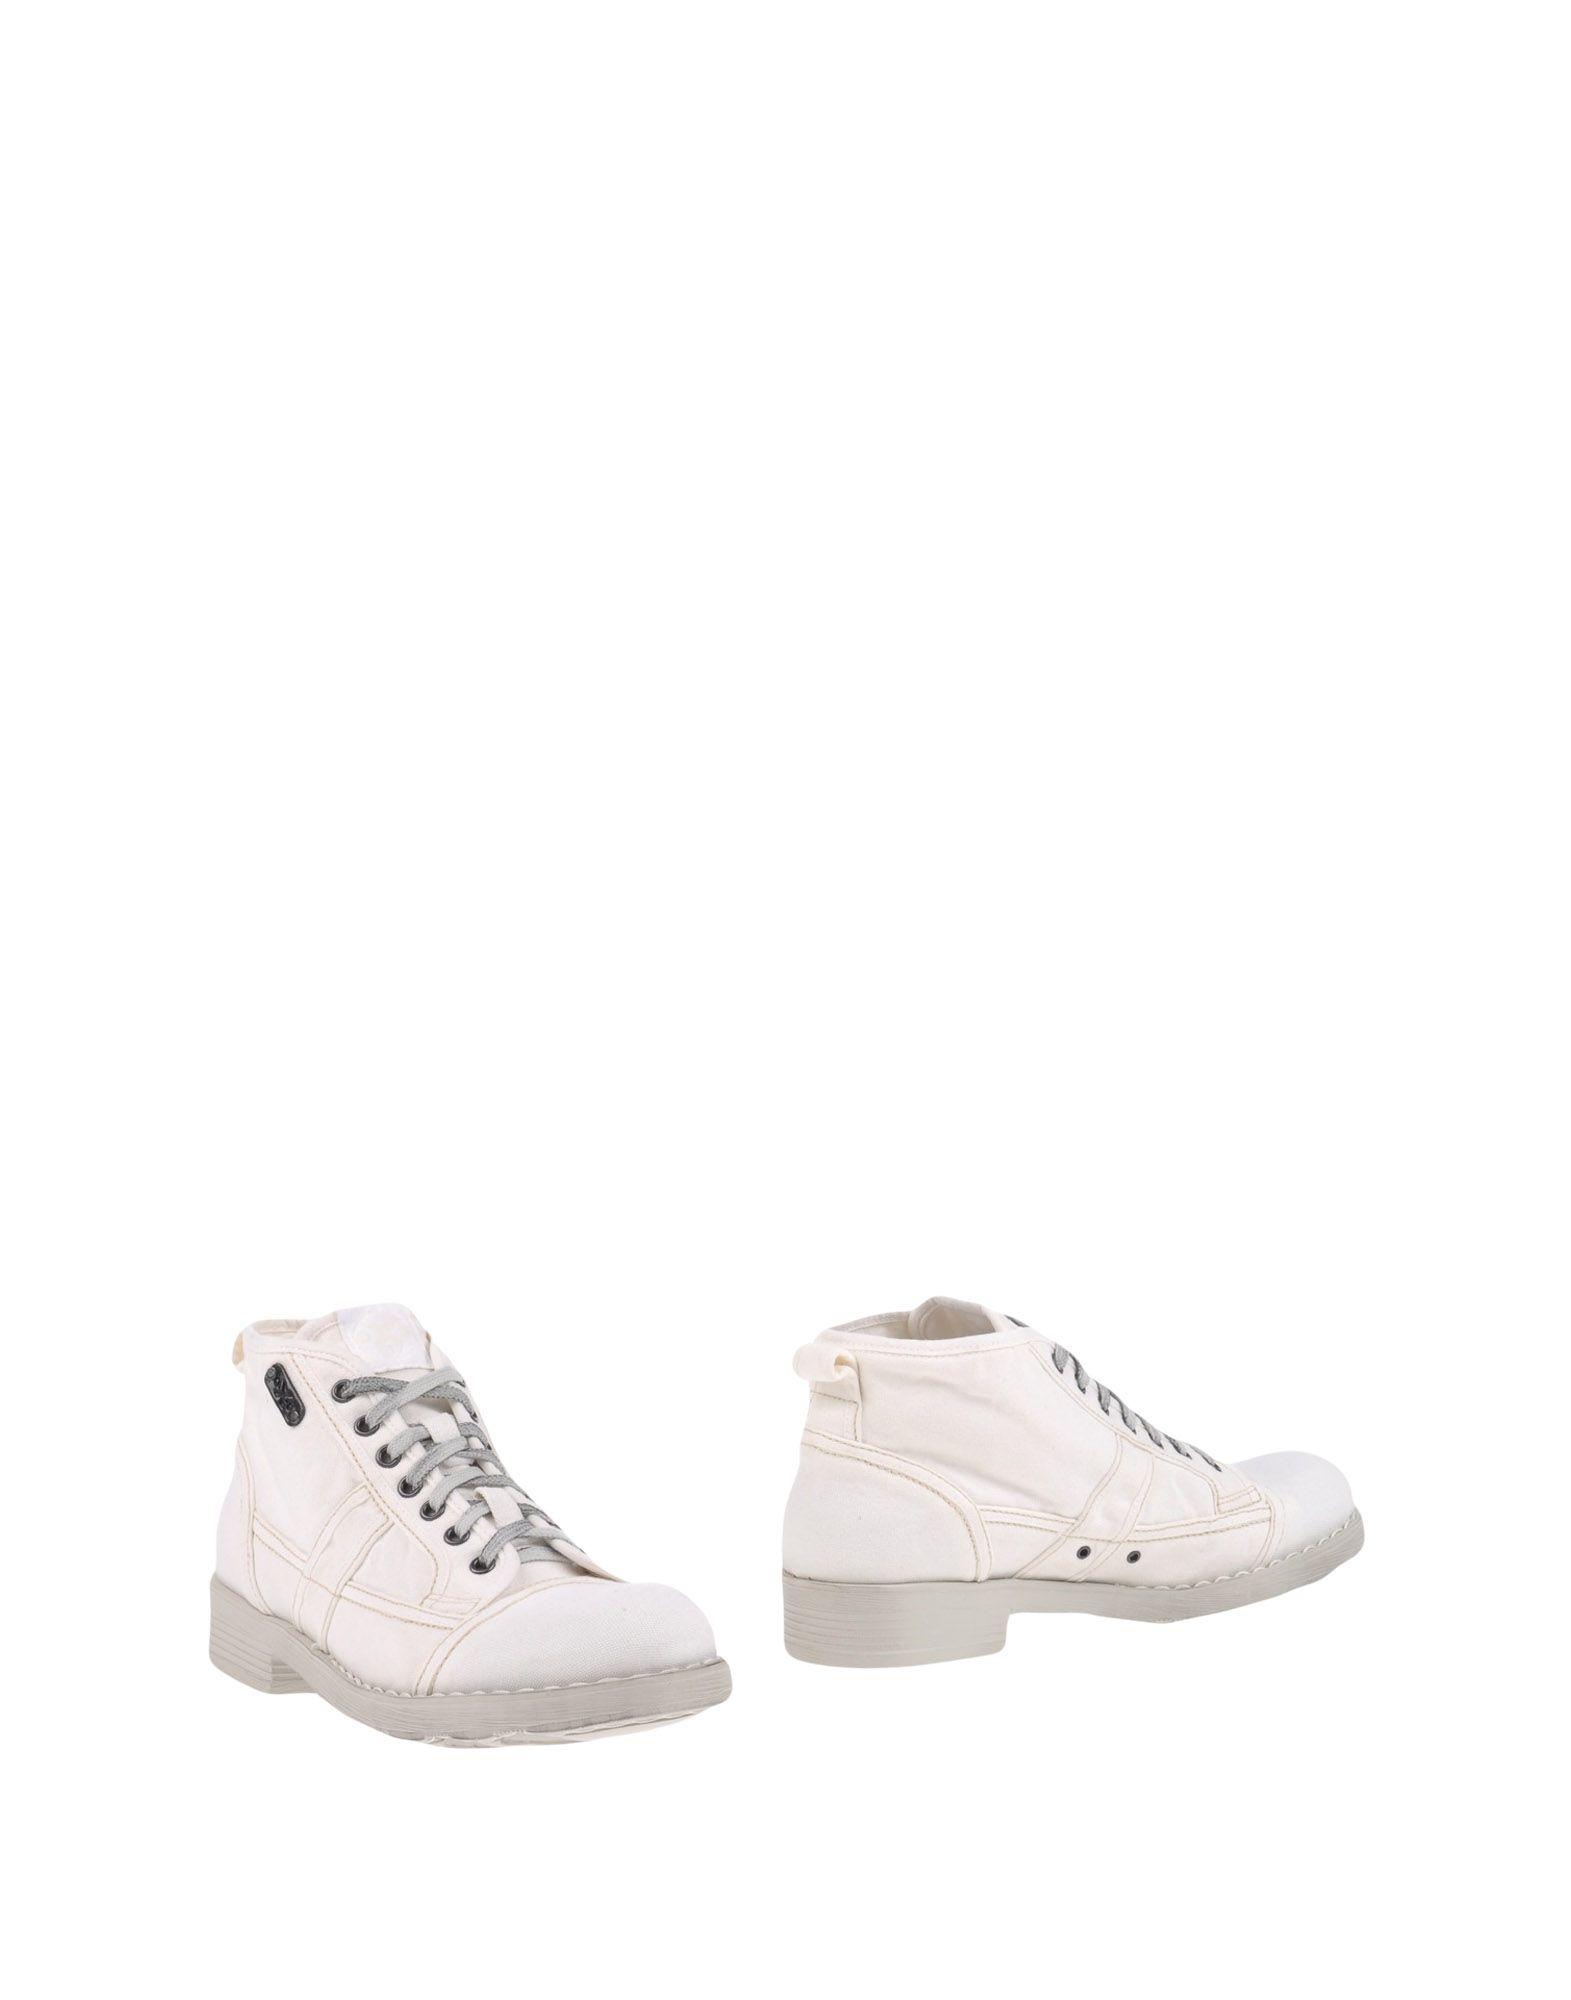 Gut um billige Schuhe zu tragenO.X.S. Stiefelette Damen  11118643KN 11118643KN 11118643KN 3e9782